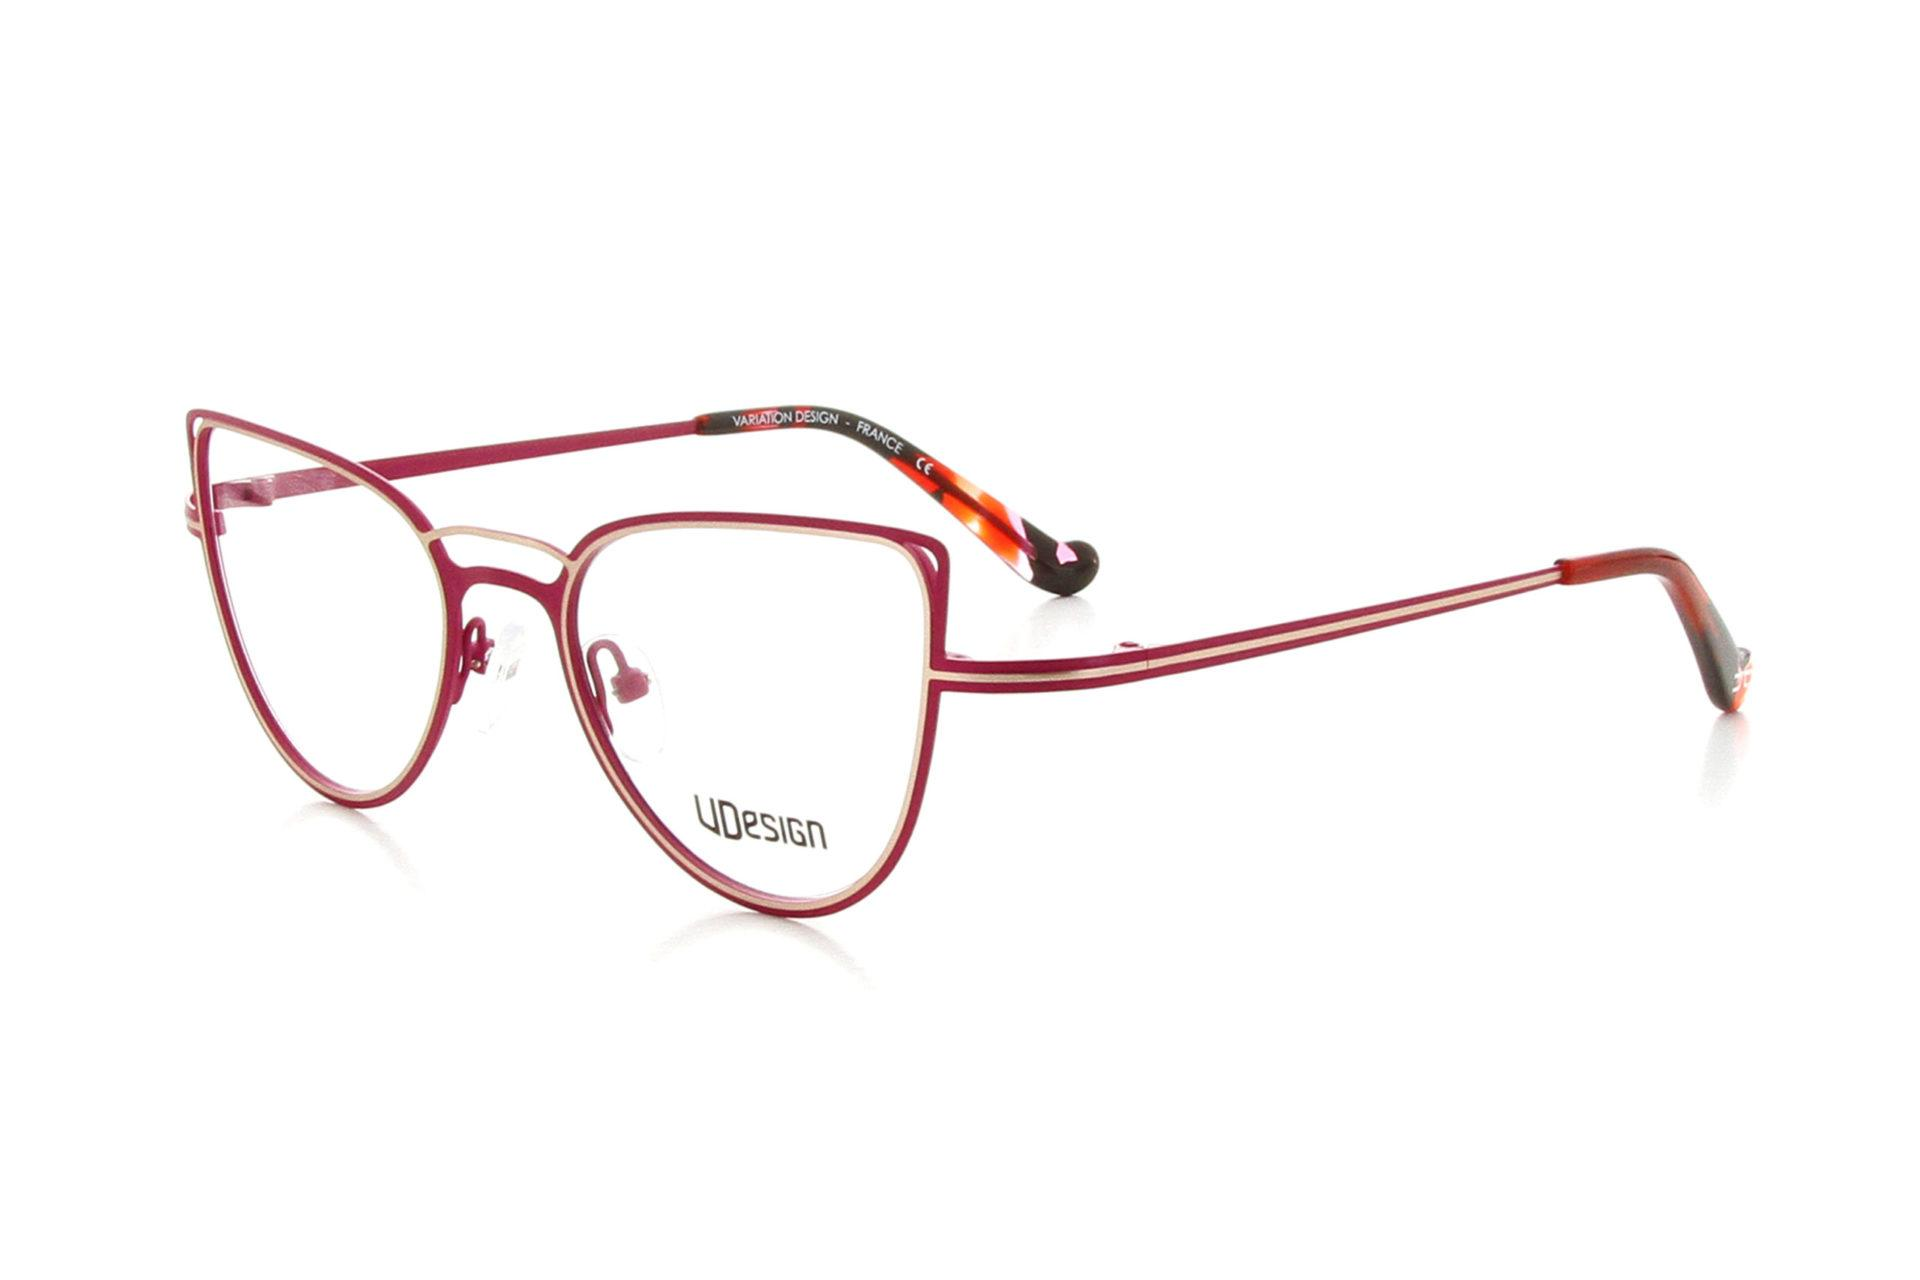 Lunette VDESIGNE rouge framboise cote